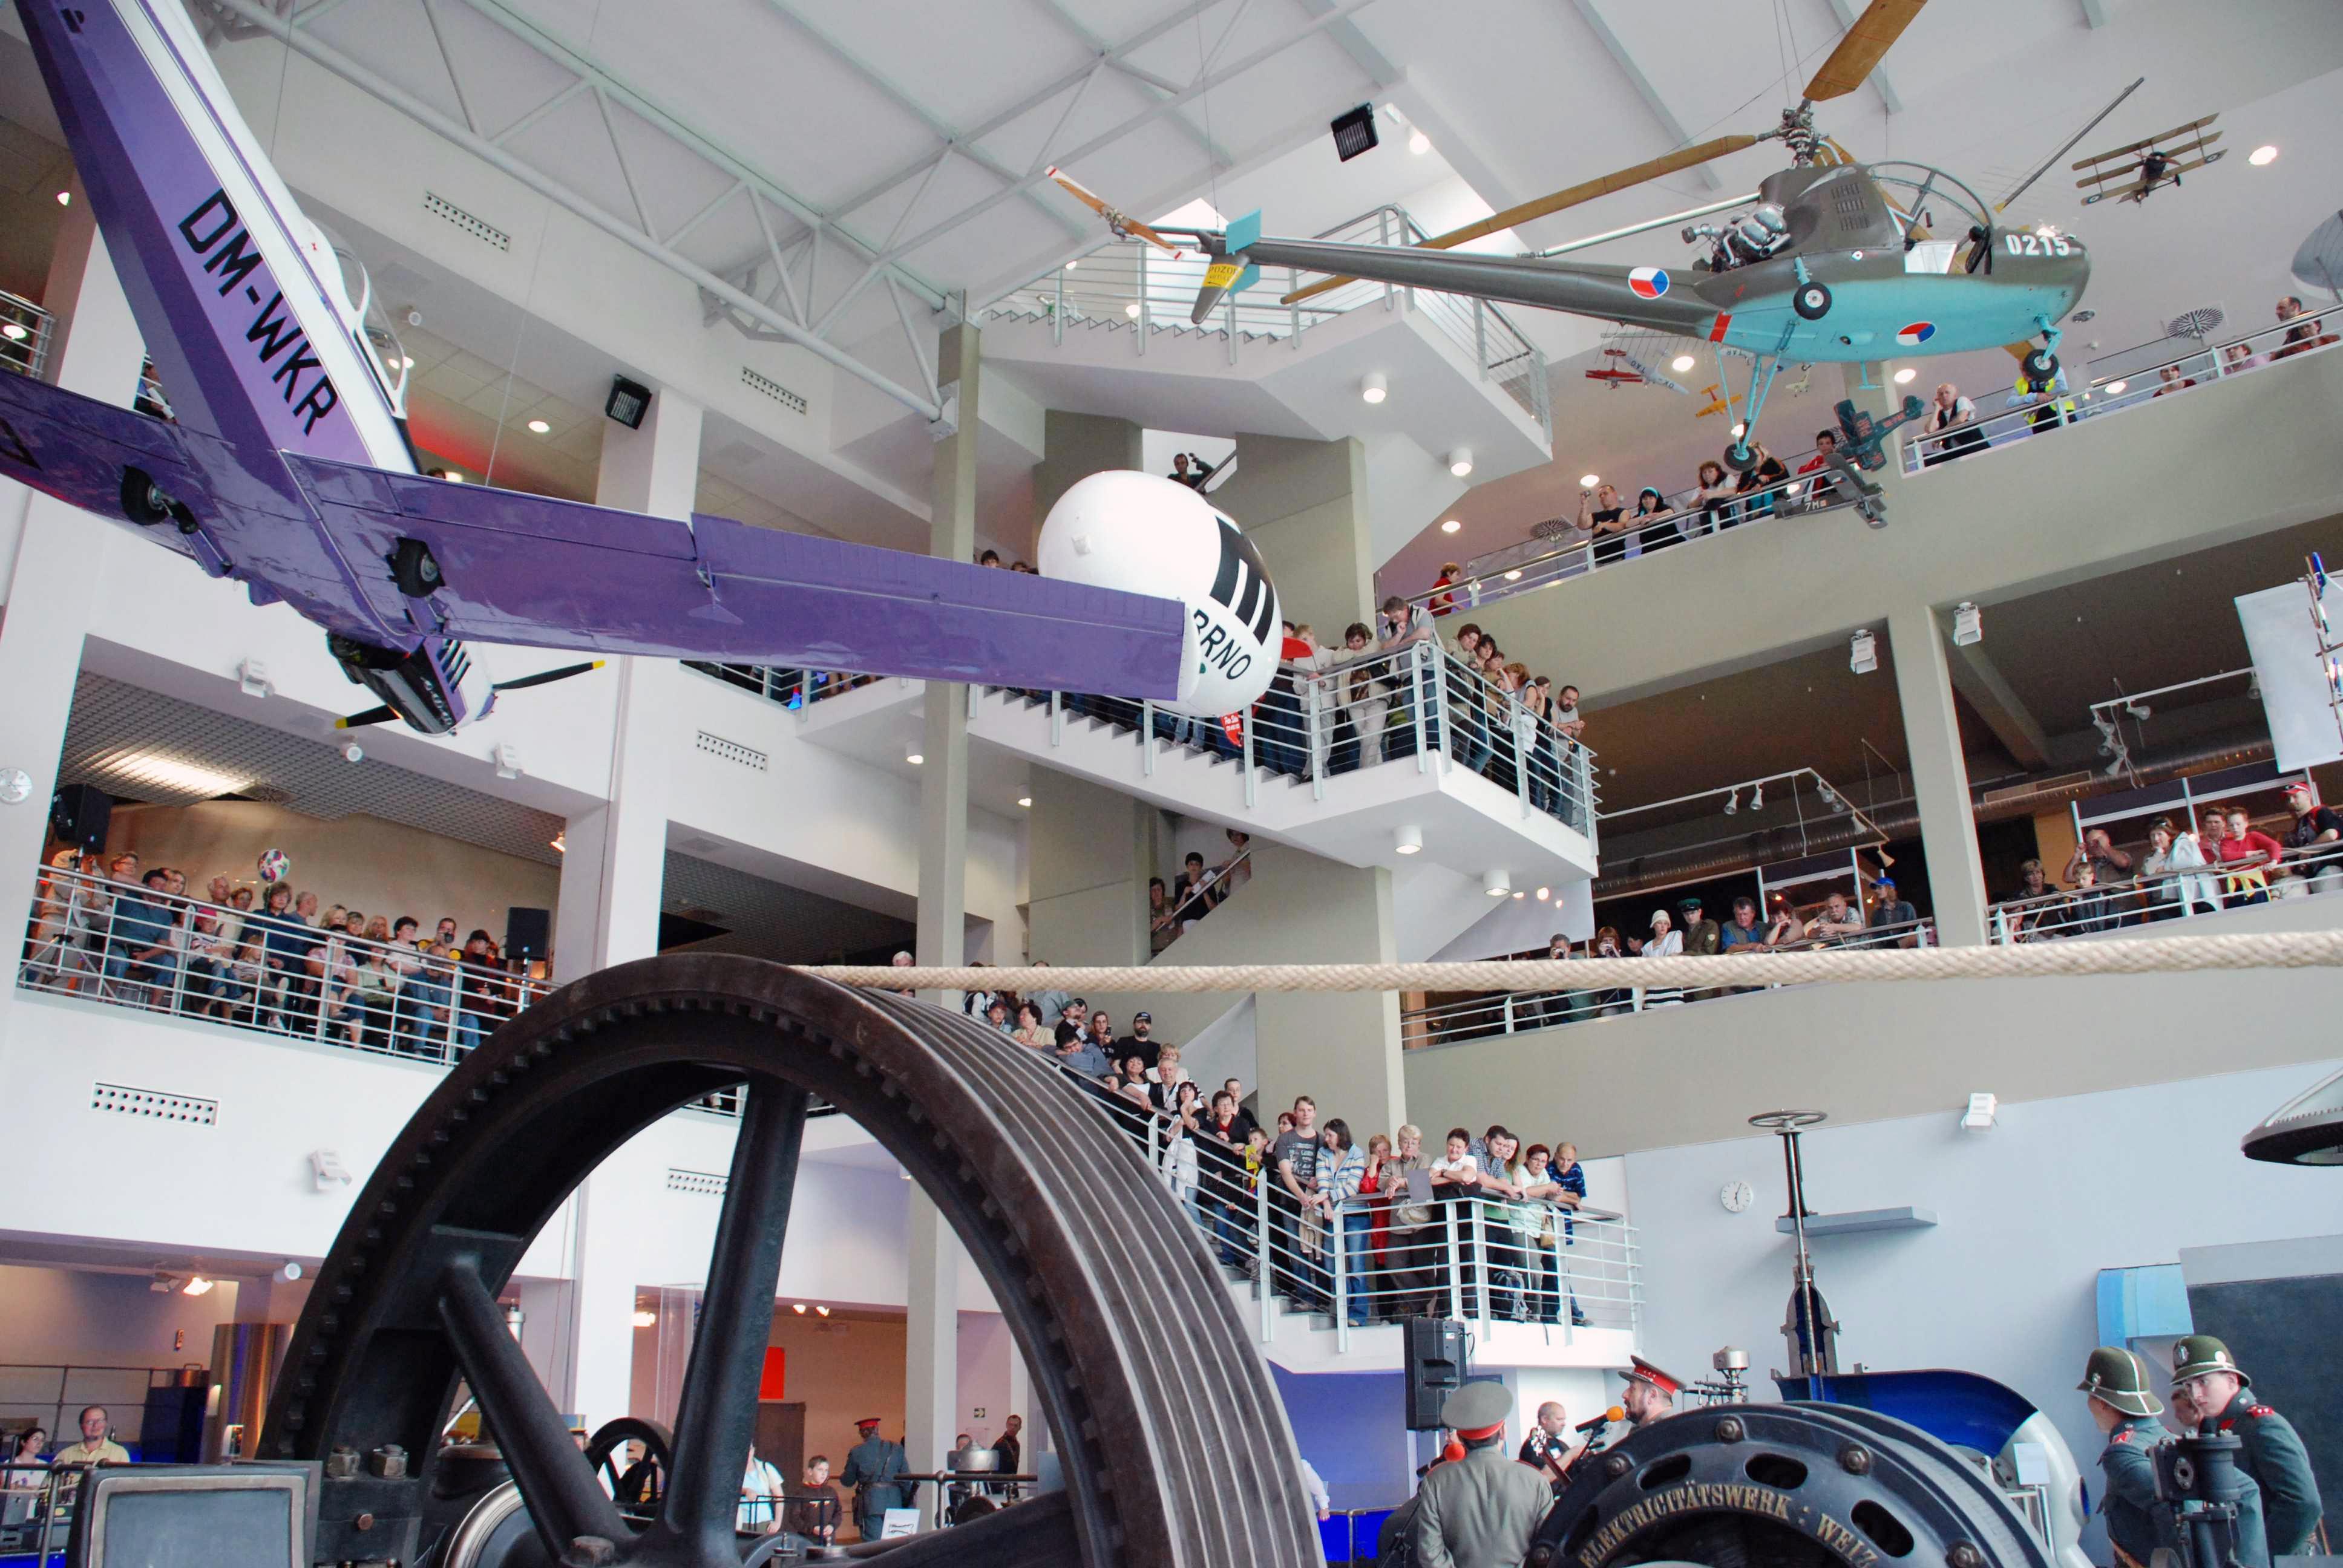 Brno Technical Museum (Technické muzeum v Brně)